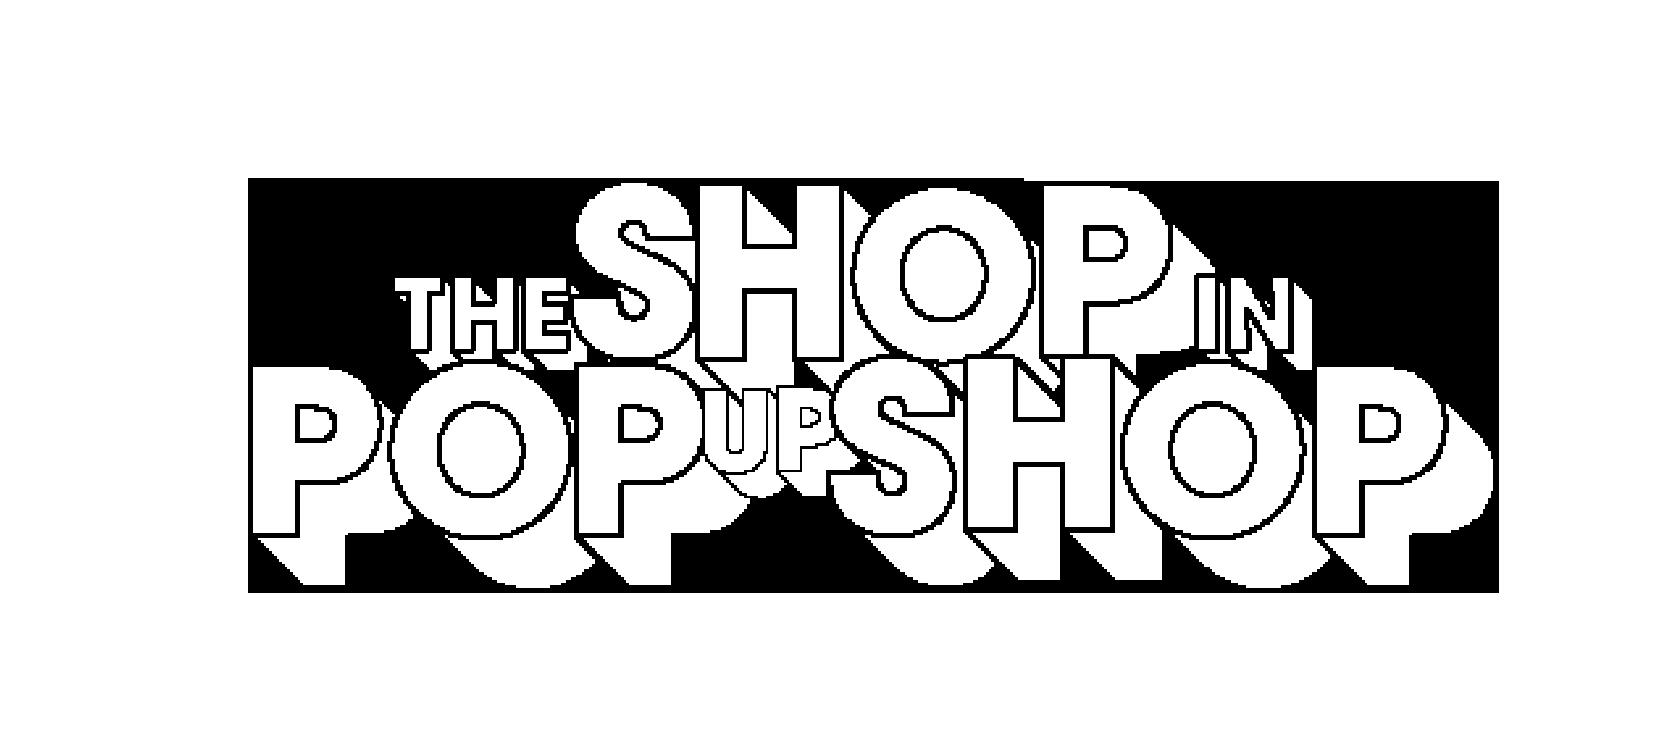 The Shop In Pop Up Shop LLC